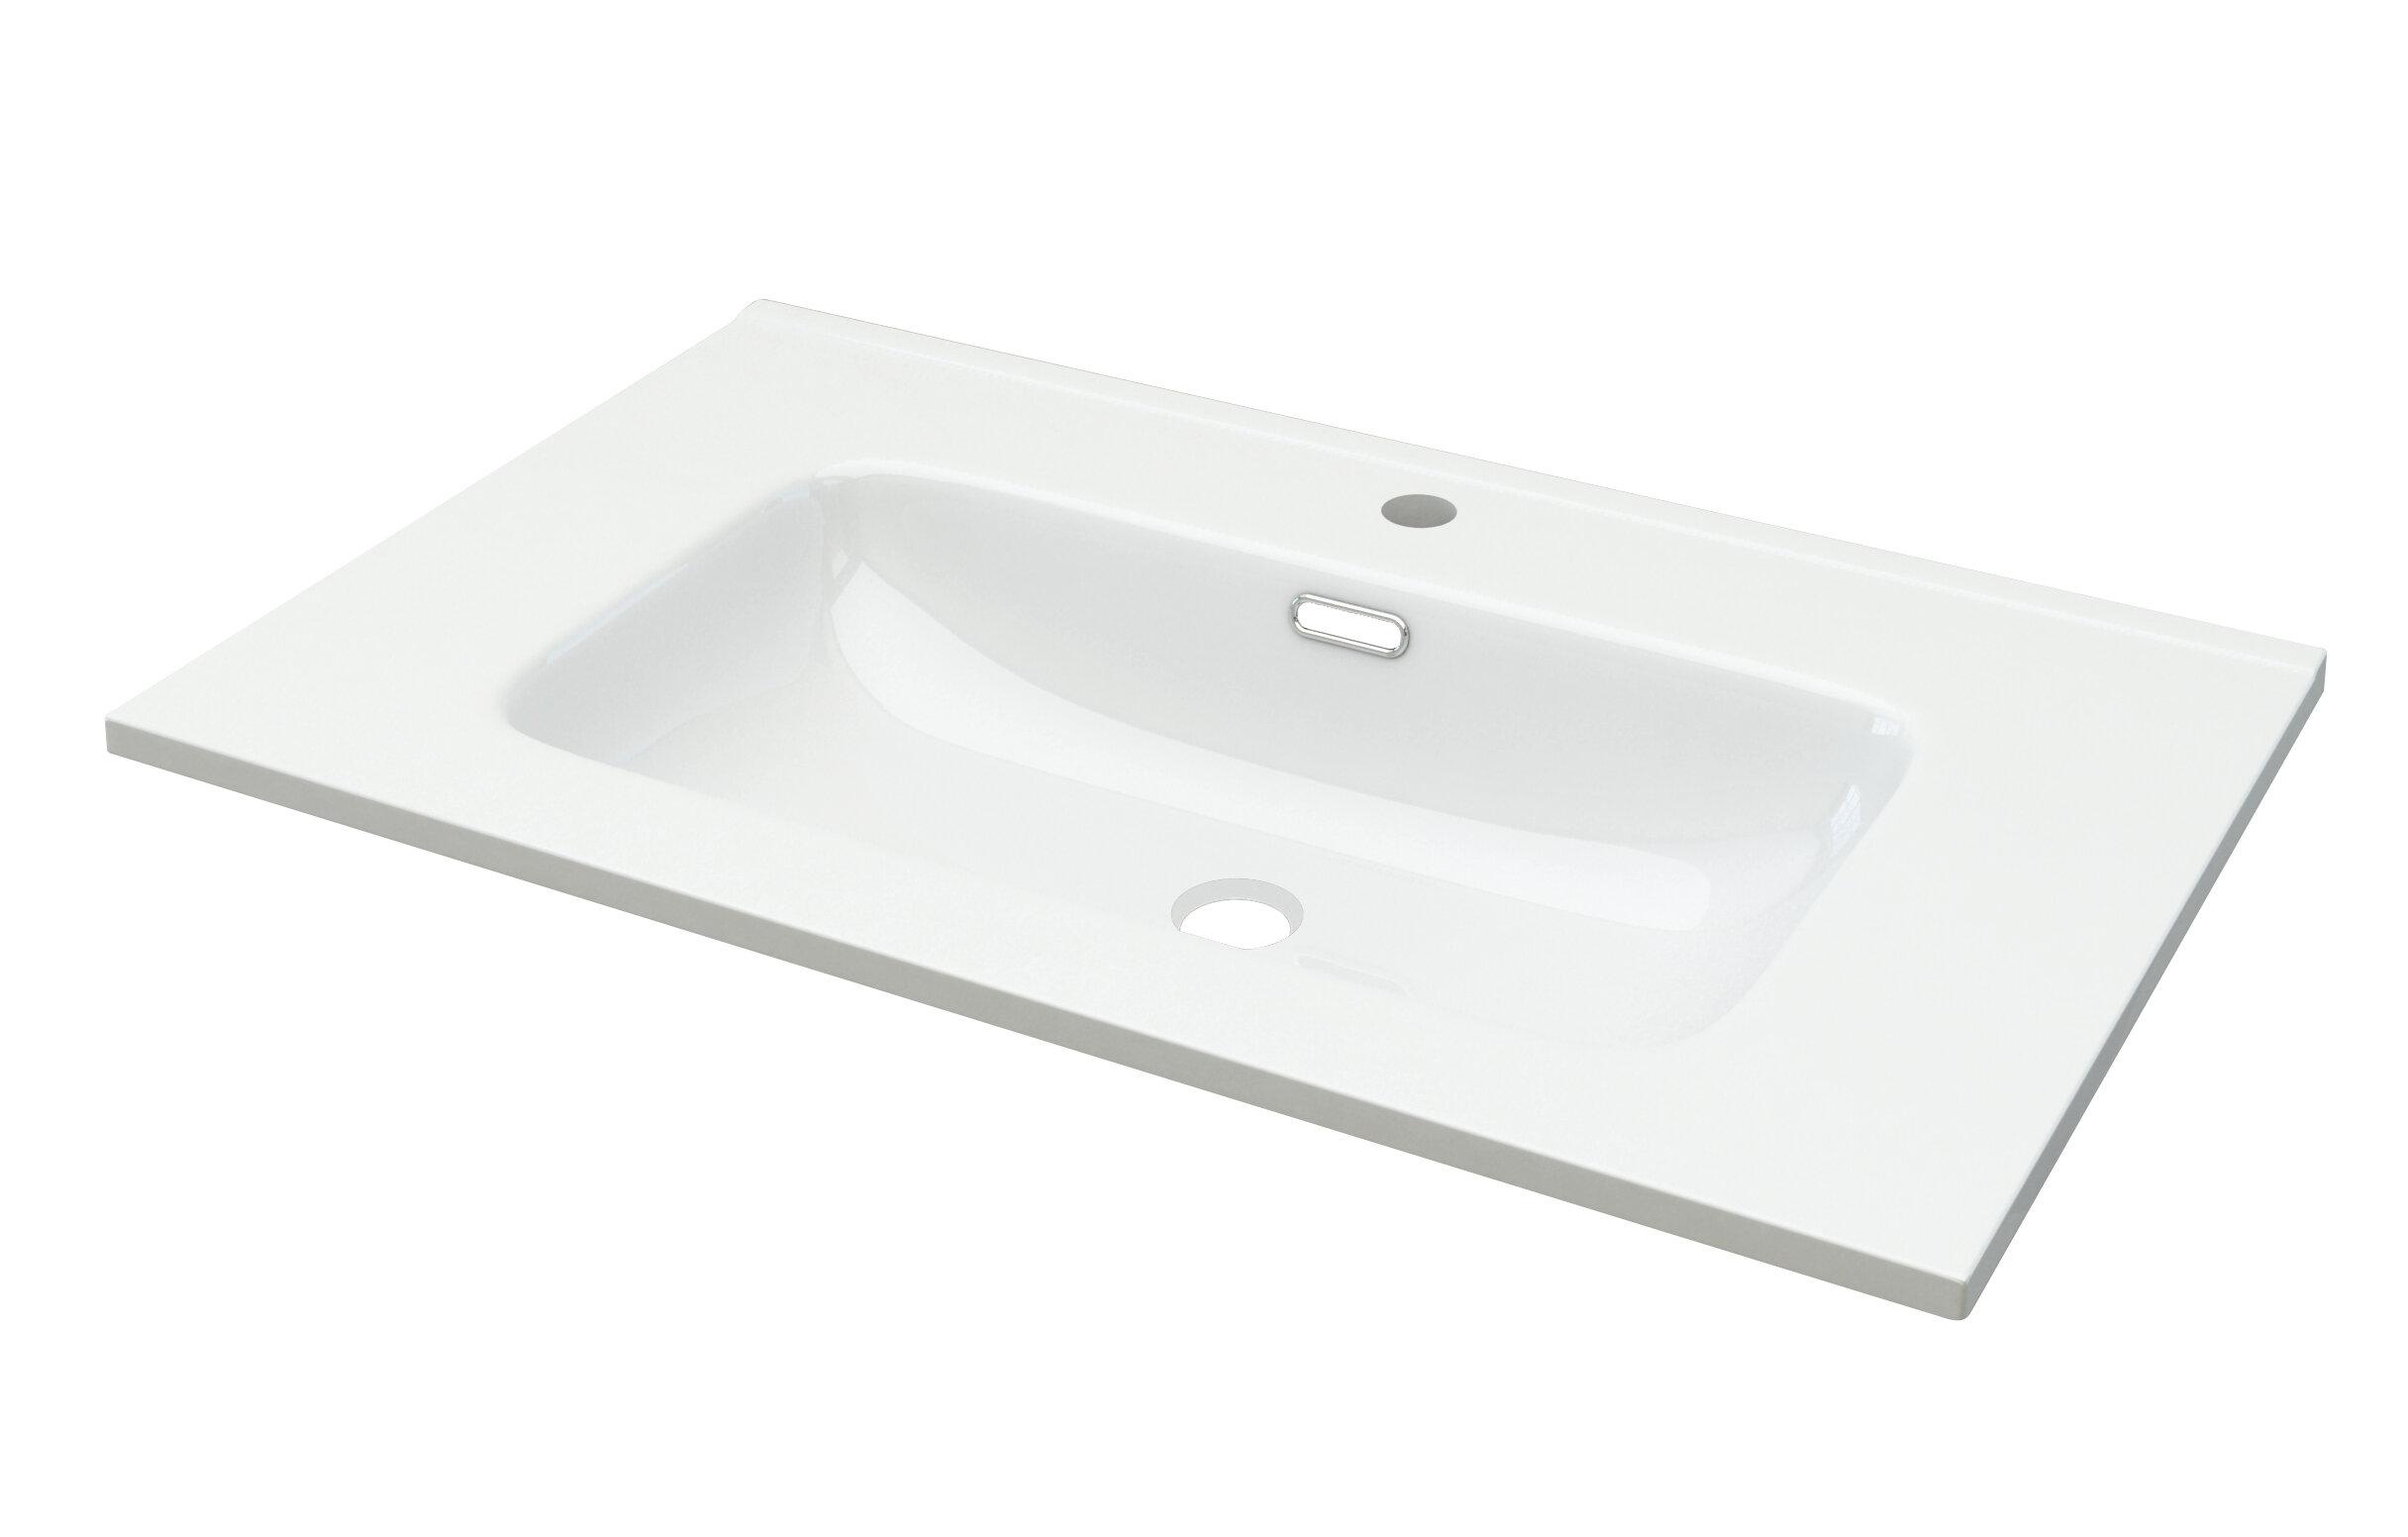 Picture of: Baden Haus Ceramic Rectangular Trough Bathroom Sink Wayfair Co Uk